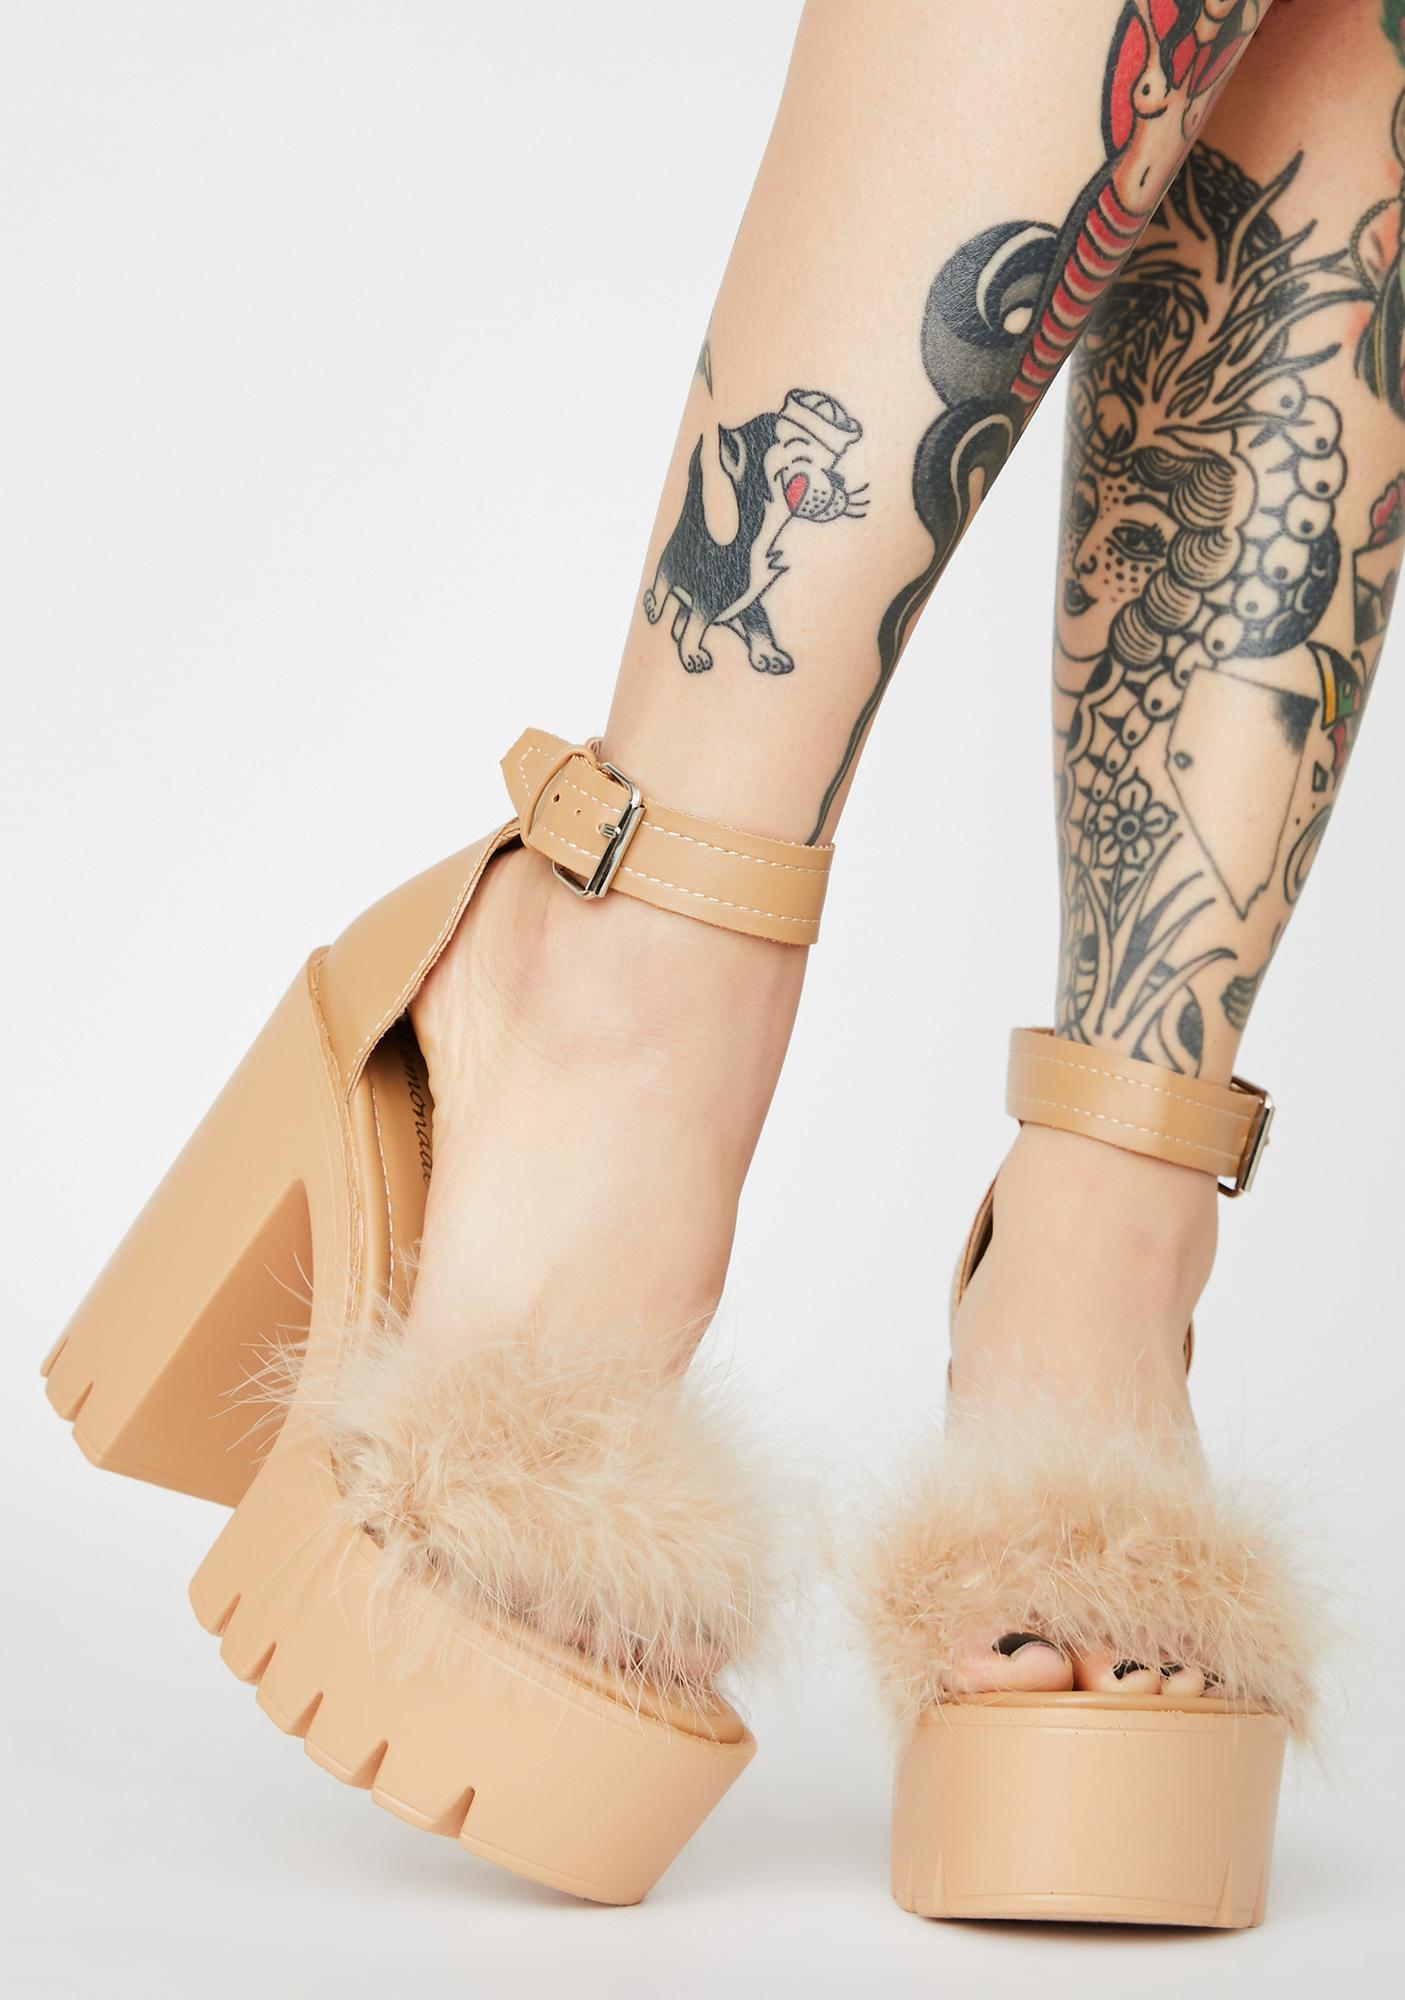 Latte Just Say So Marabou Heels